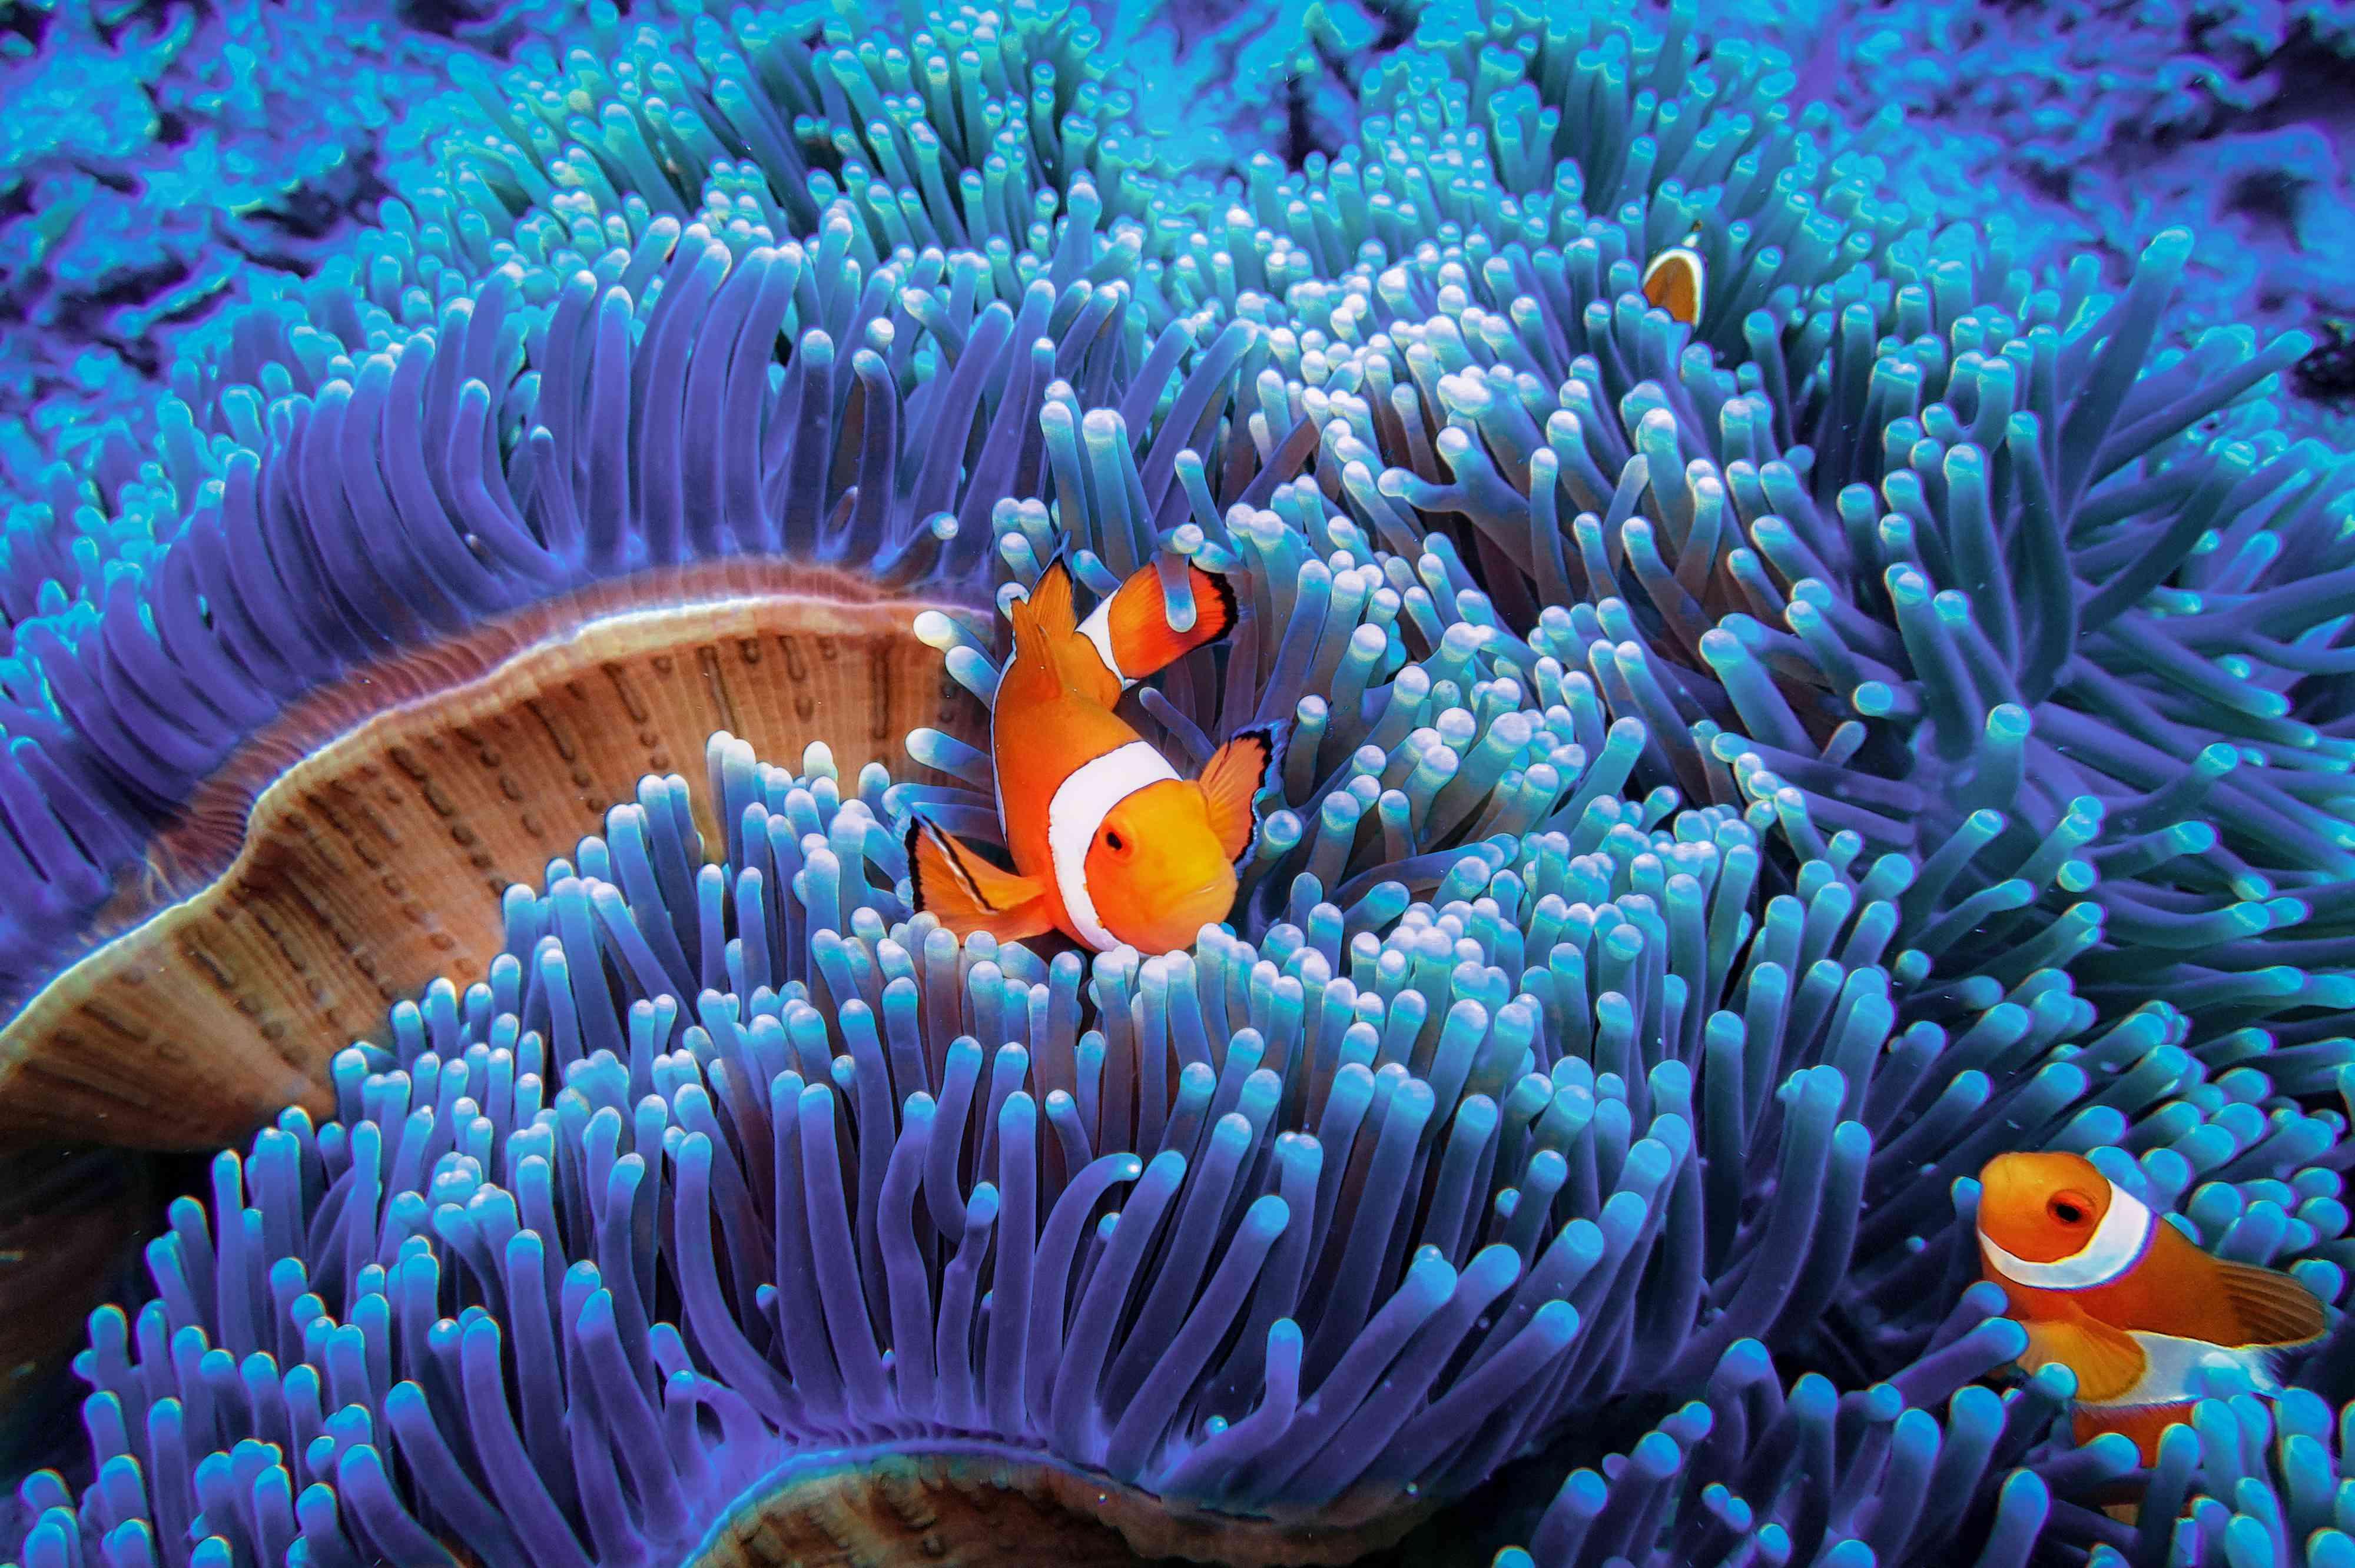 Clownfish in a blue anemone